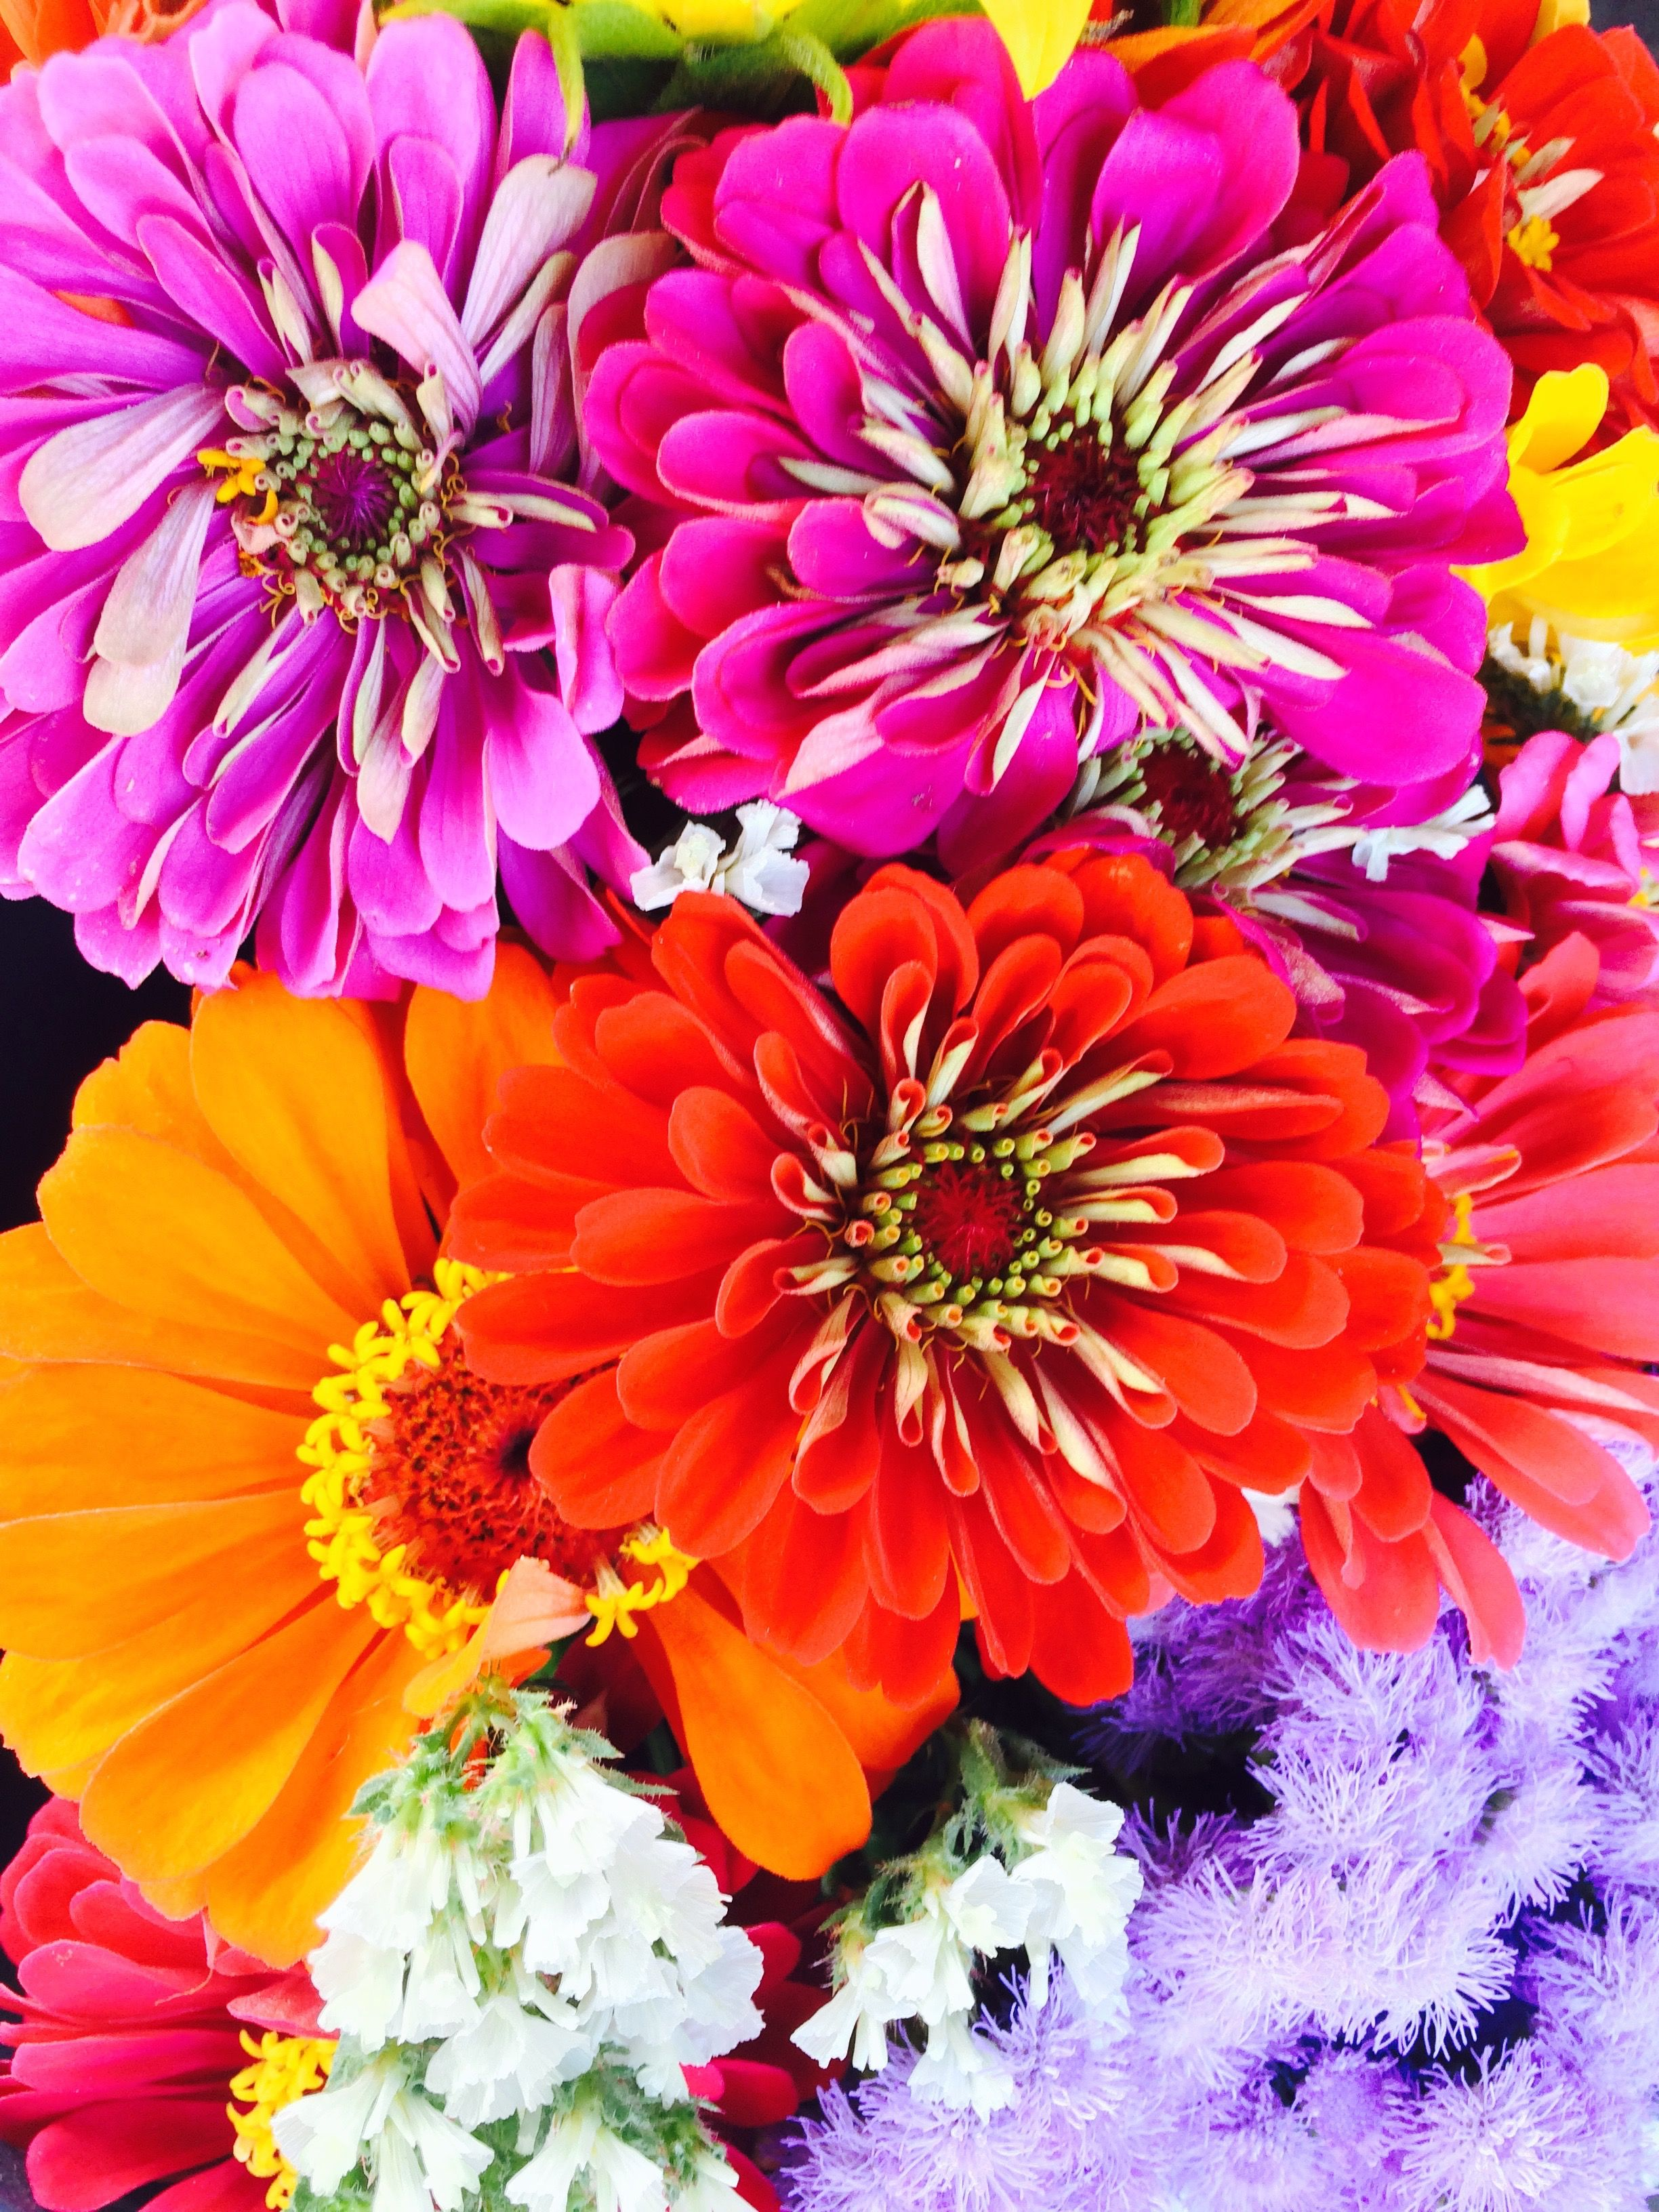 West Windsor Farmers Market - local flowers, beautiful color ...